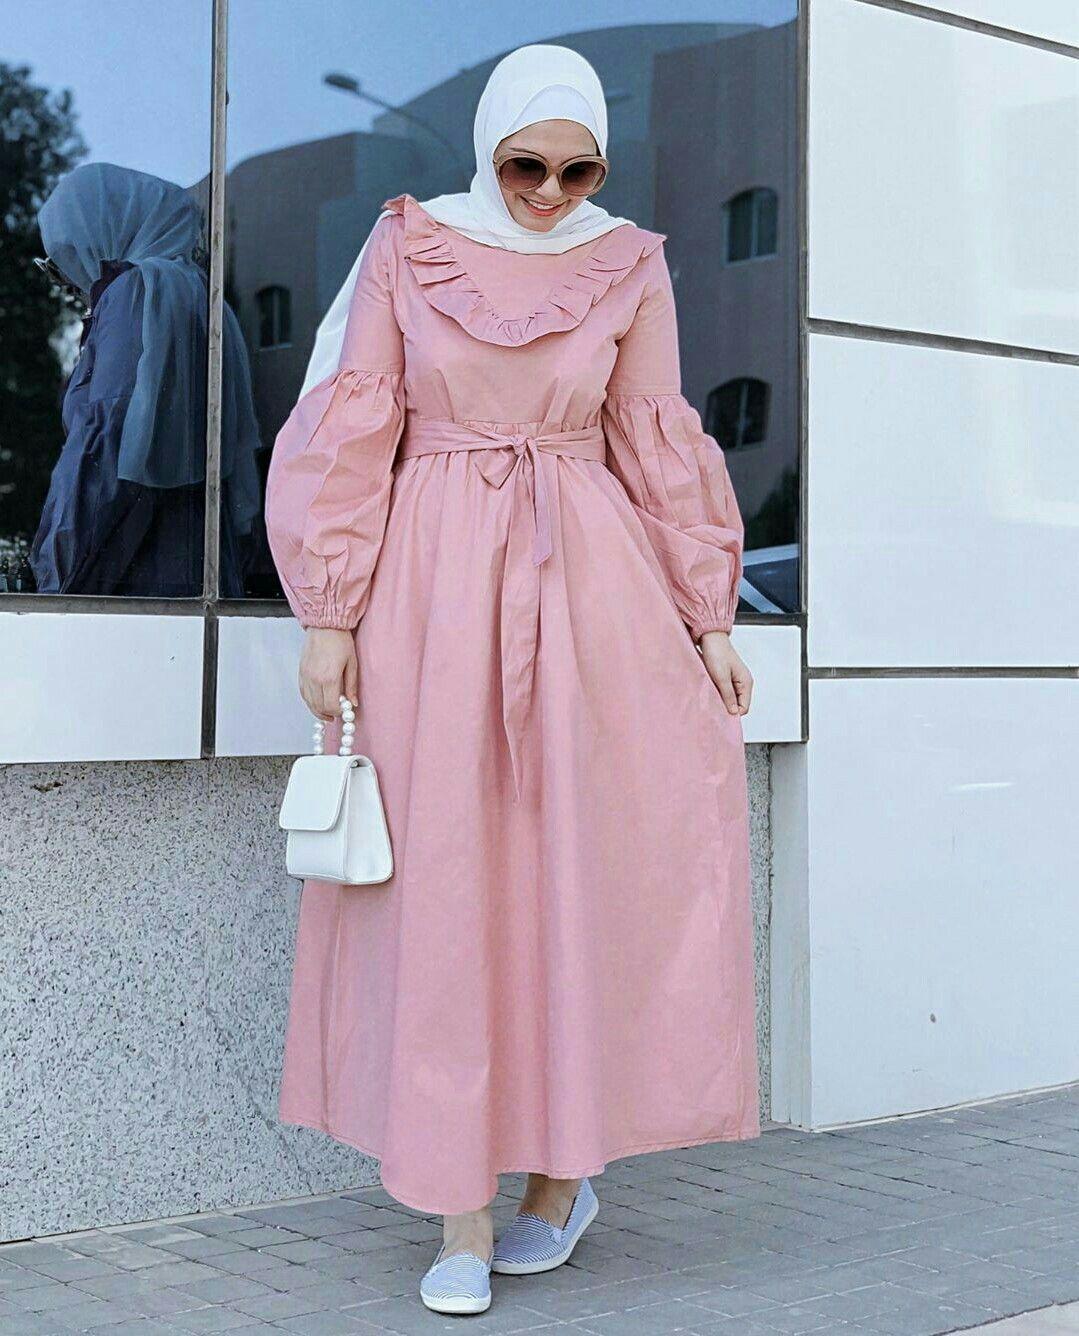 Hijab Fashion Muslim Women Hijab Fashion ملابس محجبات جيبات فساتين لبس كل يوم كاجوال عباية بناتي Muslim Fashion Dress Hijab Fashion Fashion Dresses